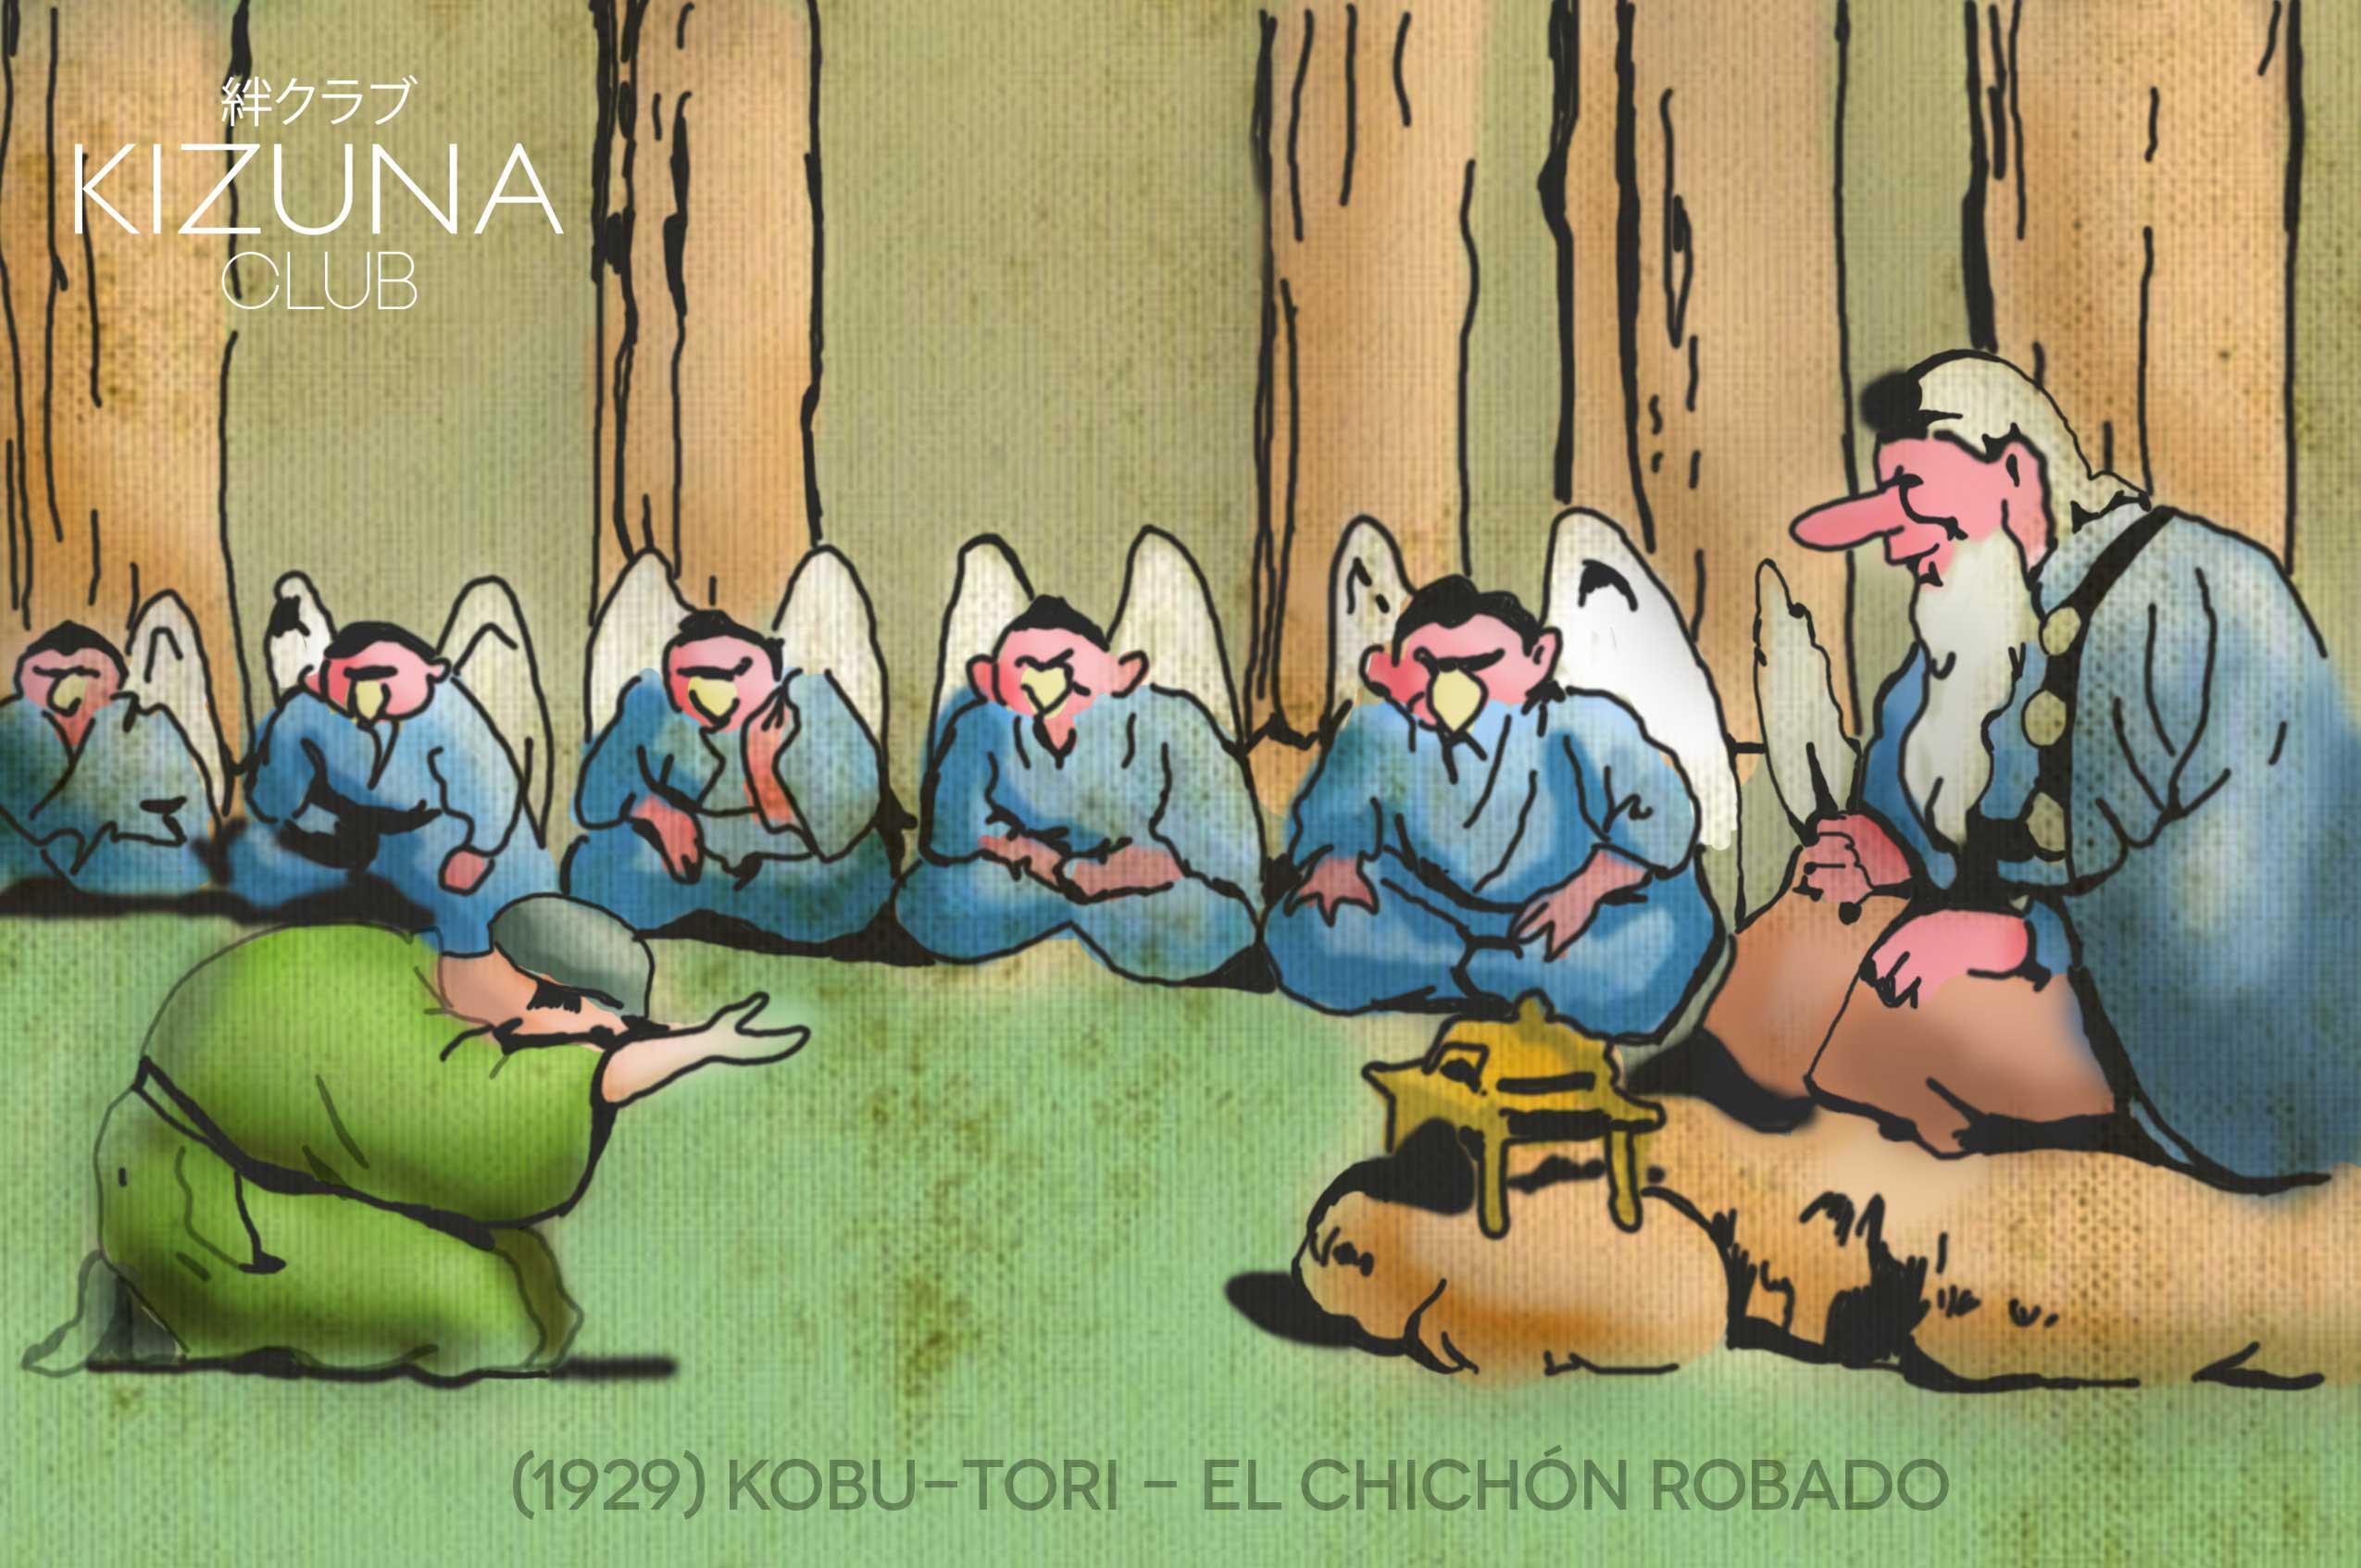 Kobutori Jisan, la calidad de la vieja animación japonesa en 1929